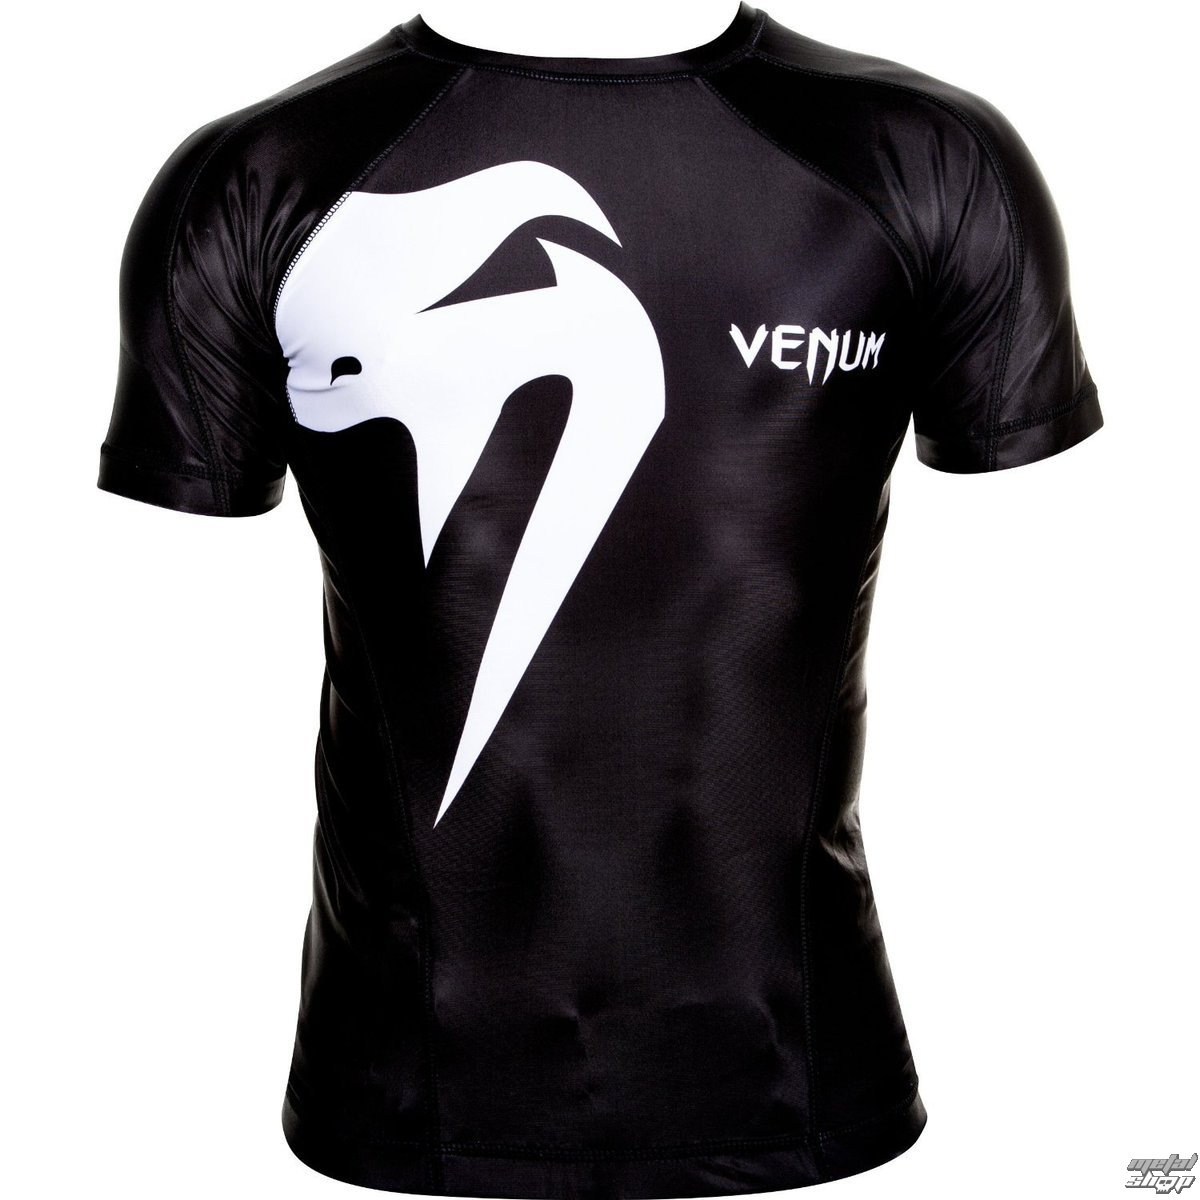 tričko pánské (termo) VENUM - Giant Rashguard - Black - EU-VENUM-0149